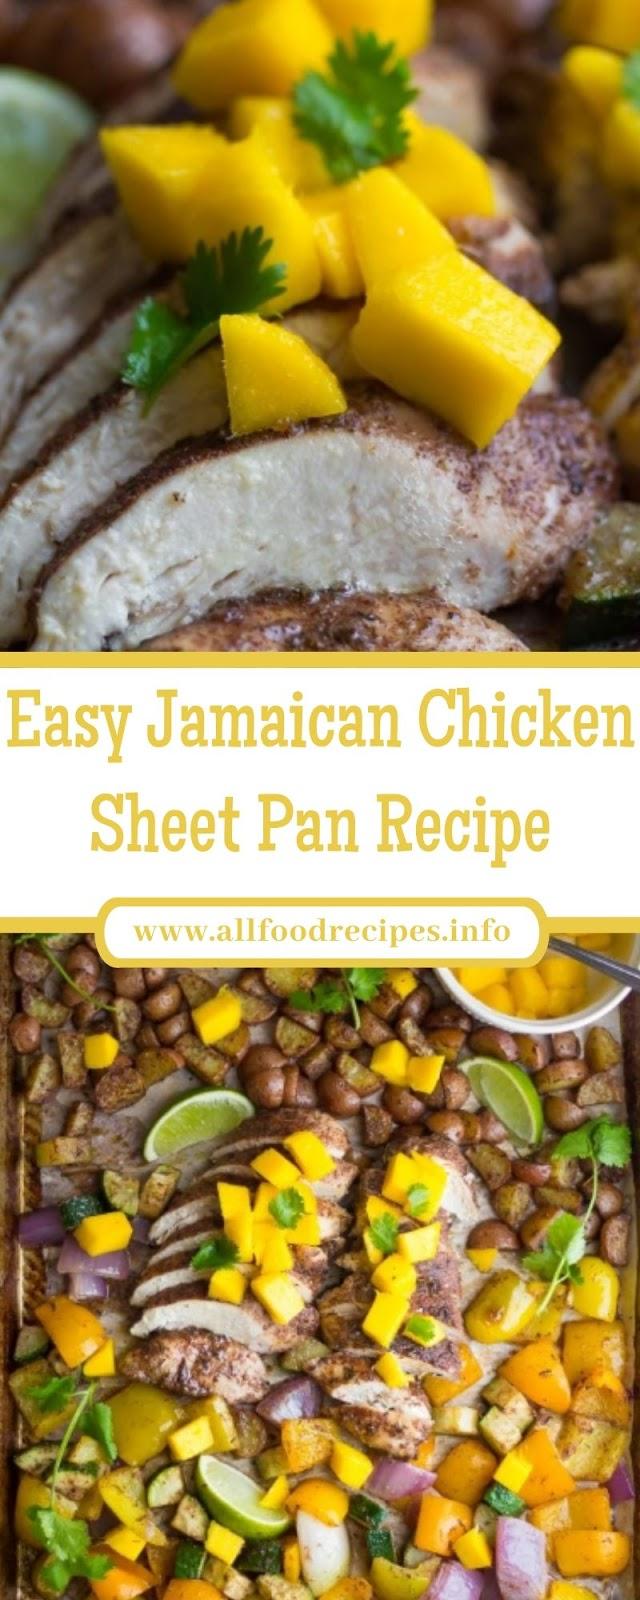 Easy Jamaican Chicken Sheet Pan Recipe